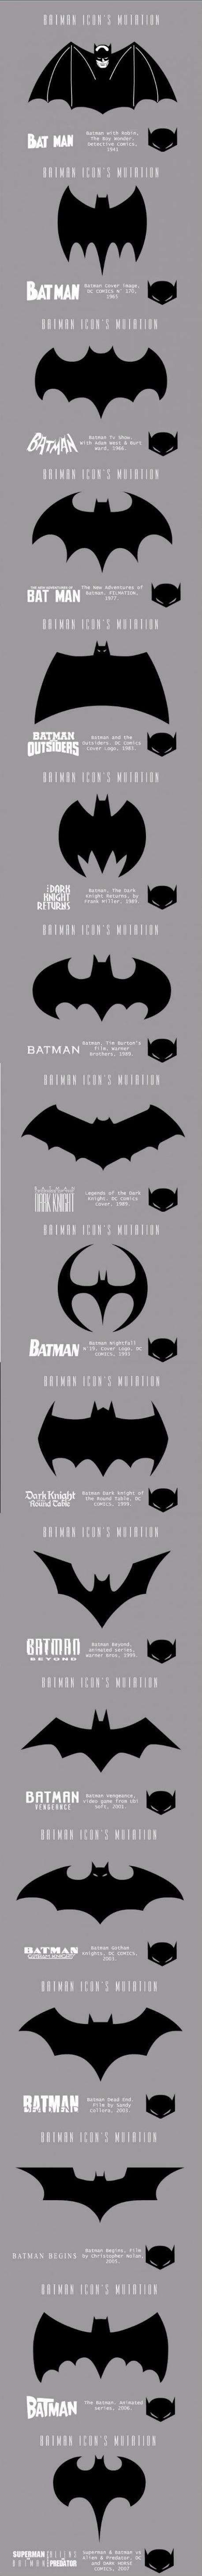 The evolution of Batman logo